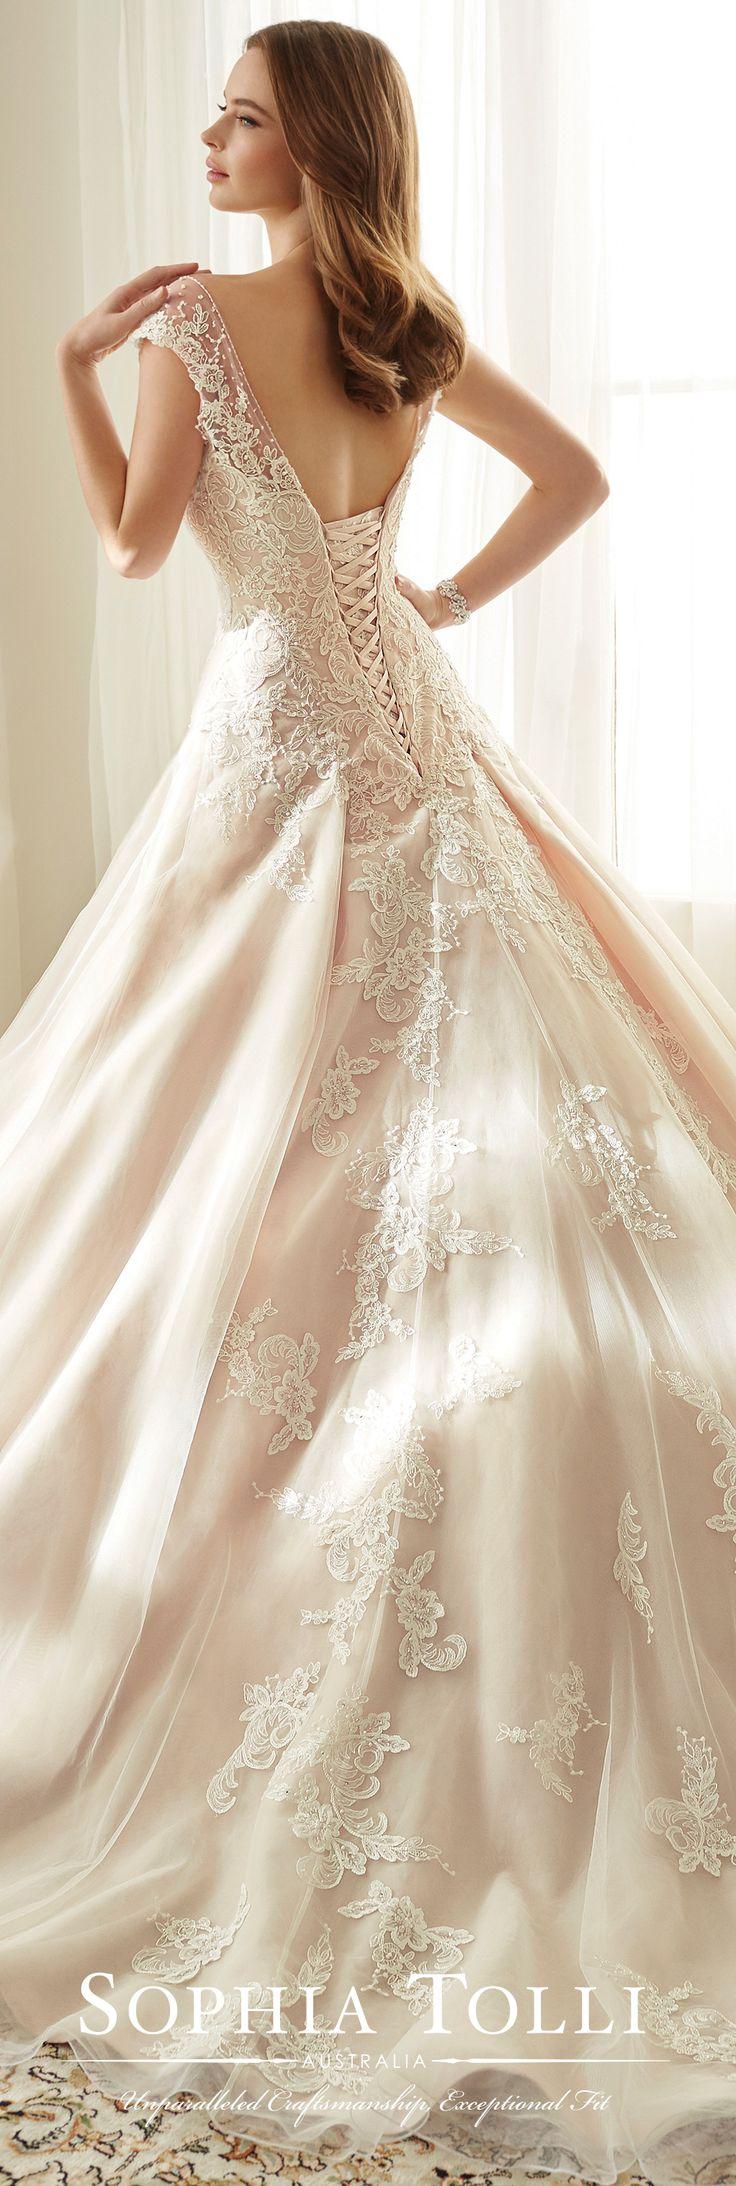 Best 25 Corset back wedding dress ideas on Pinterest  Nice wedding dresses Ruffle wedding